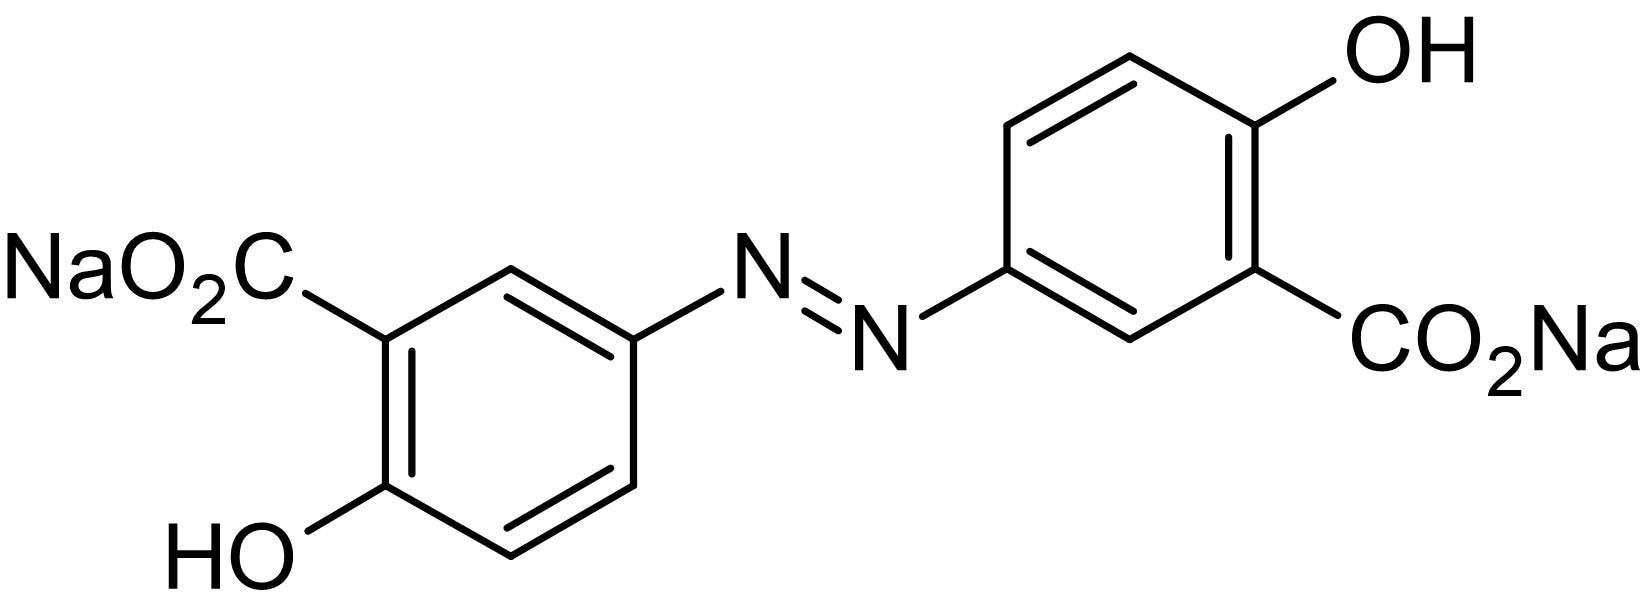 Chemical Structure - Olsalazine sodium, Anti-inflammatory agent (ab142929)